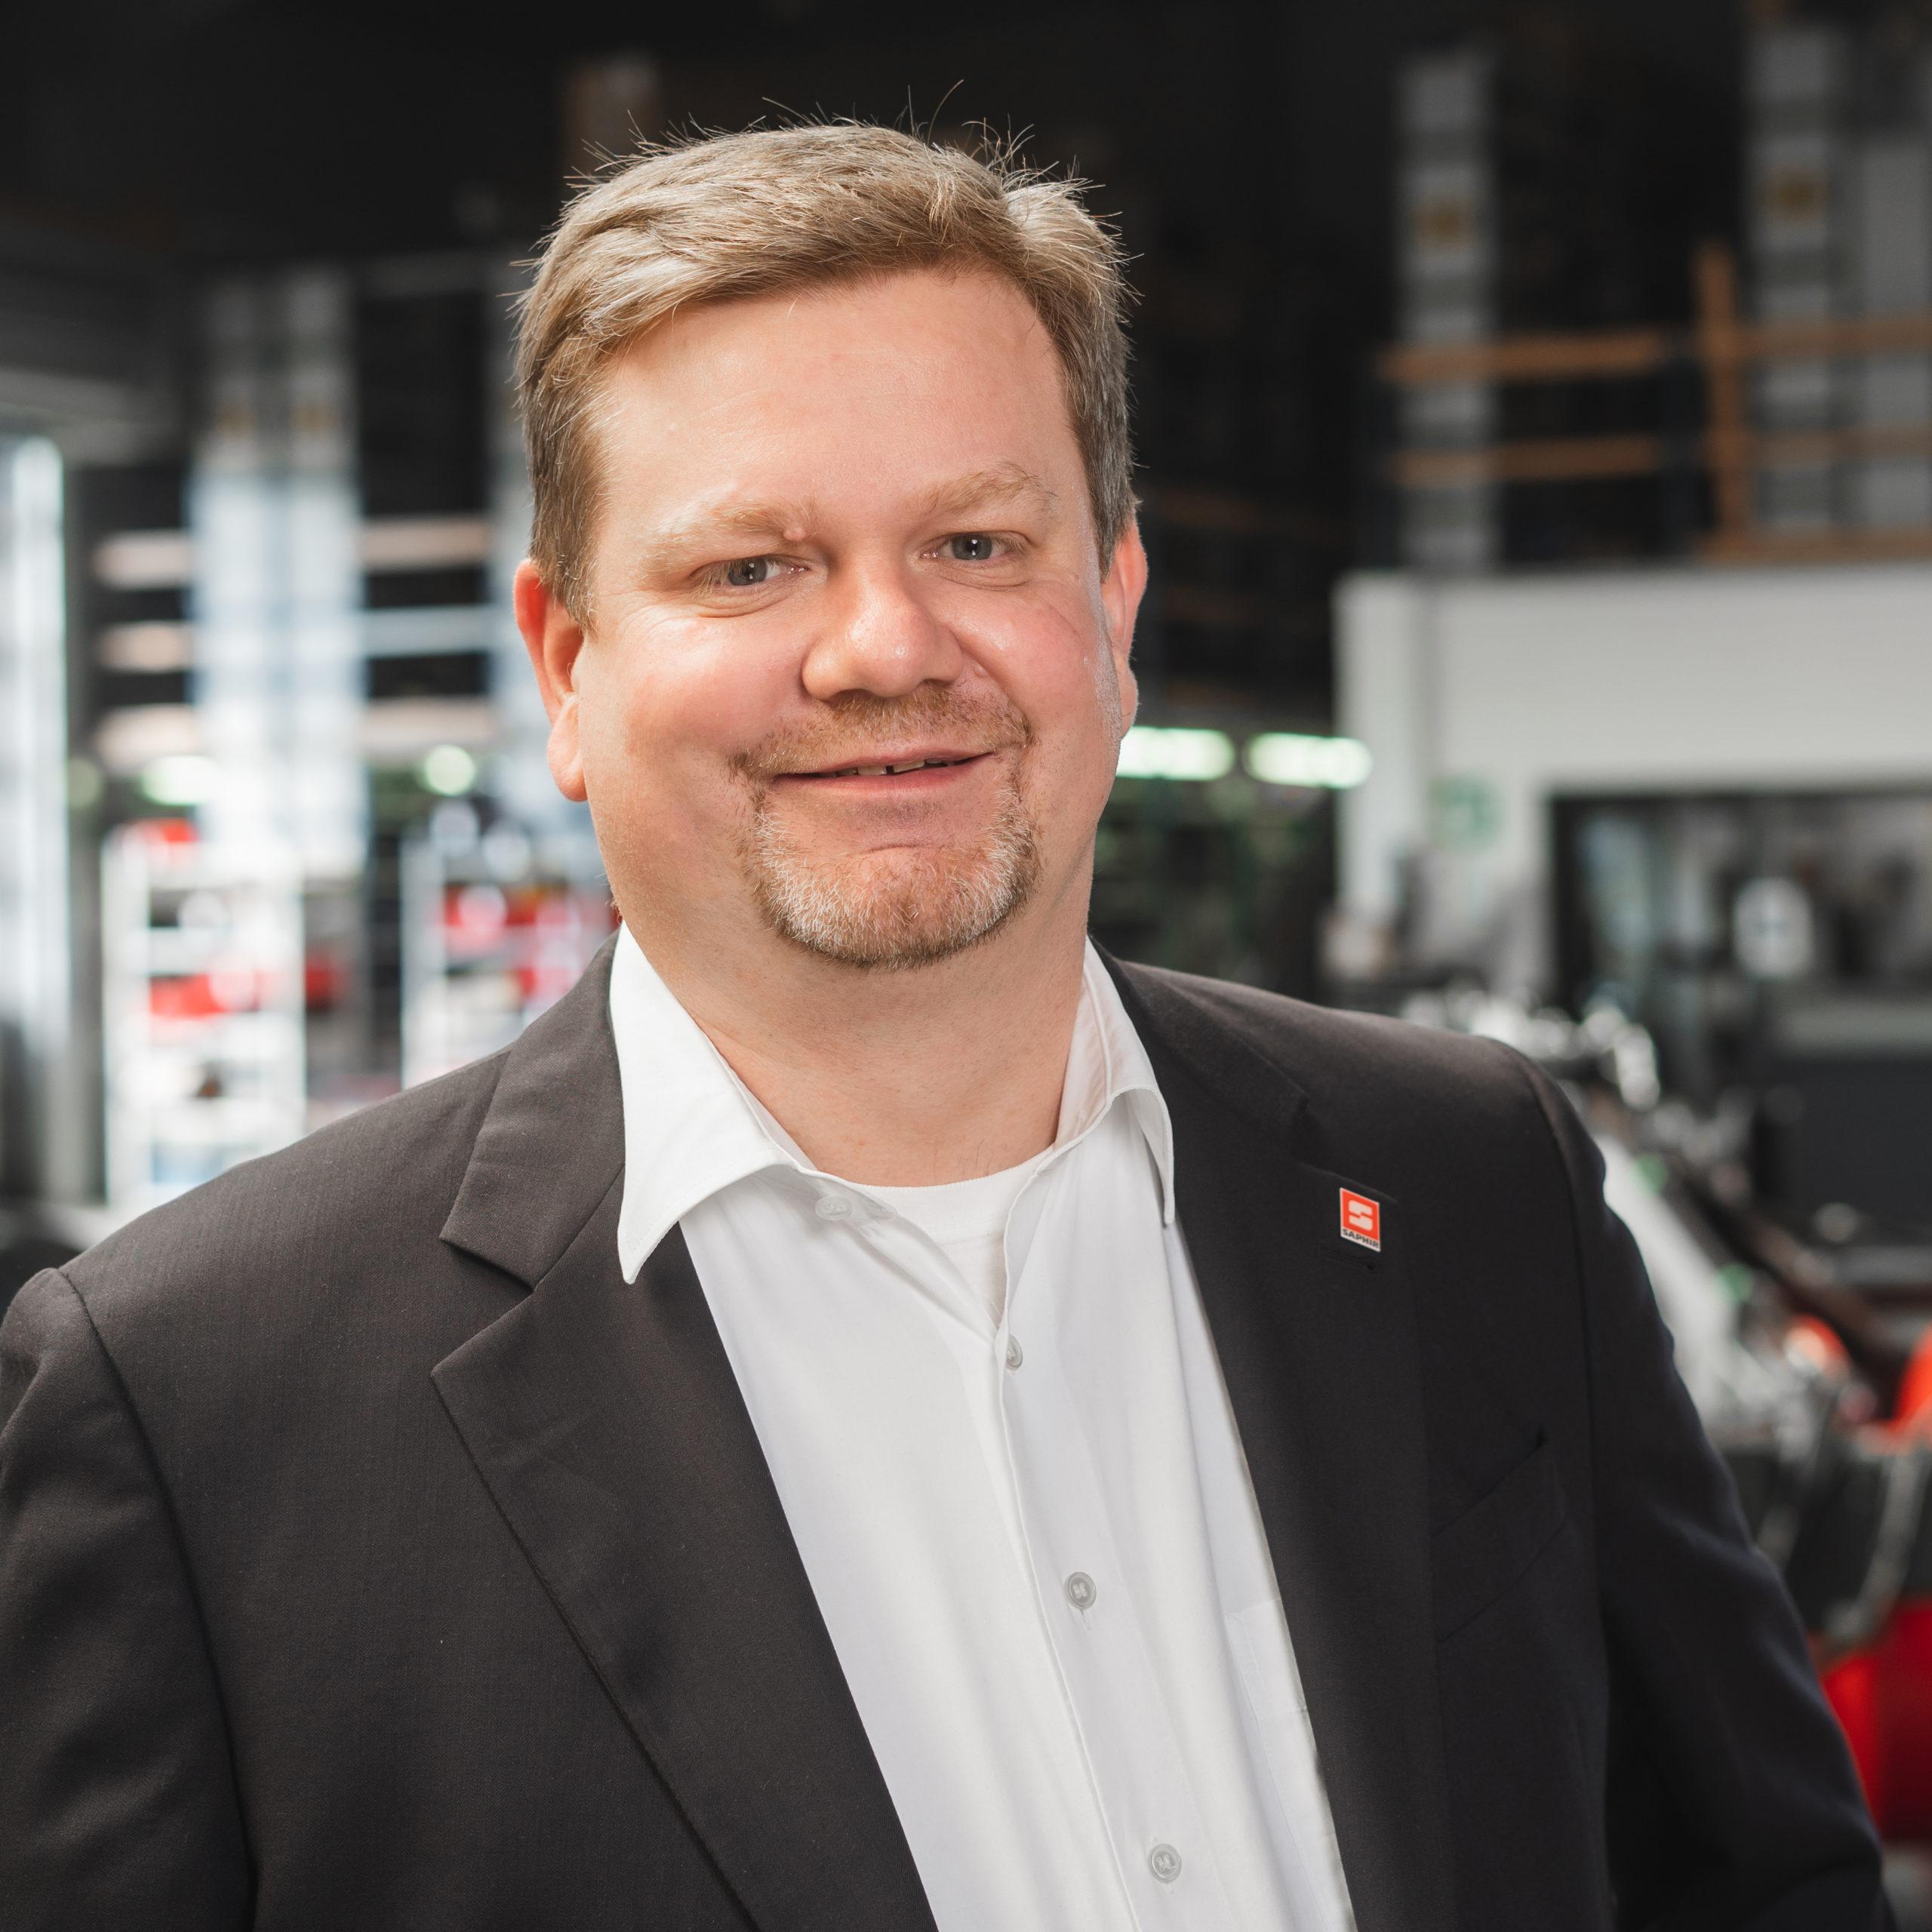 Mario Wiechern